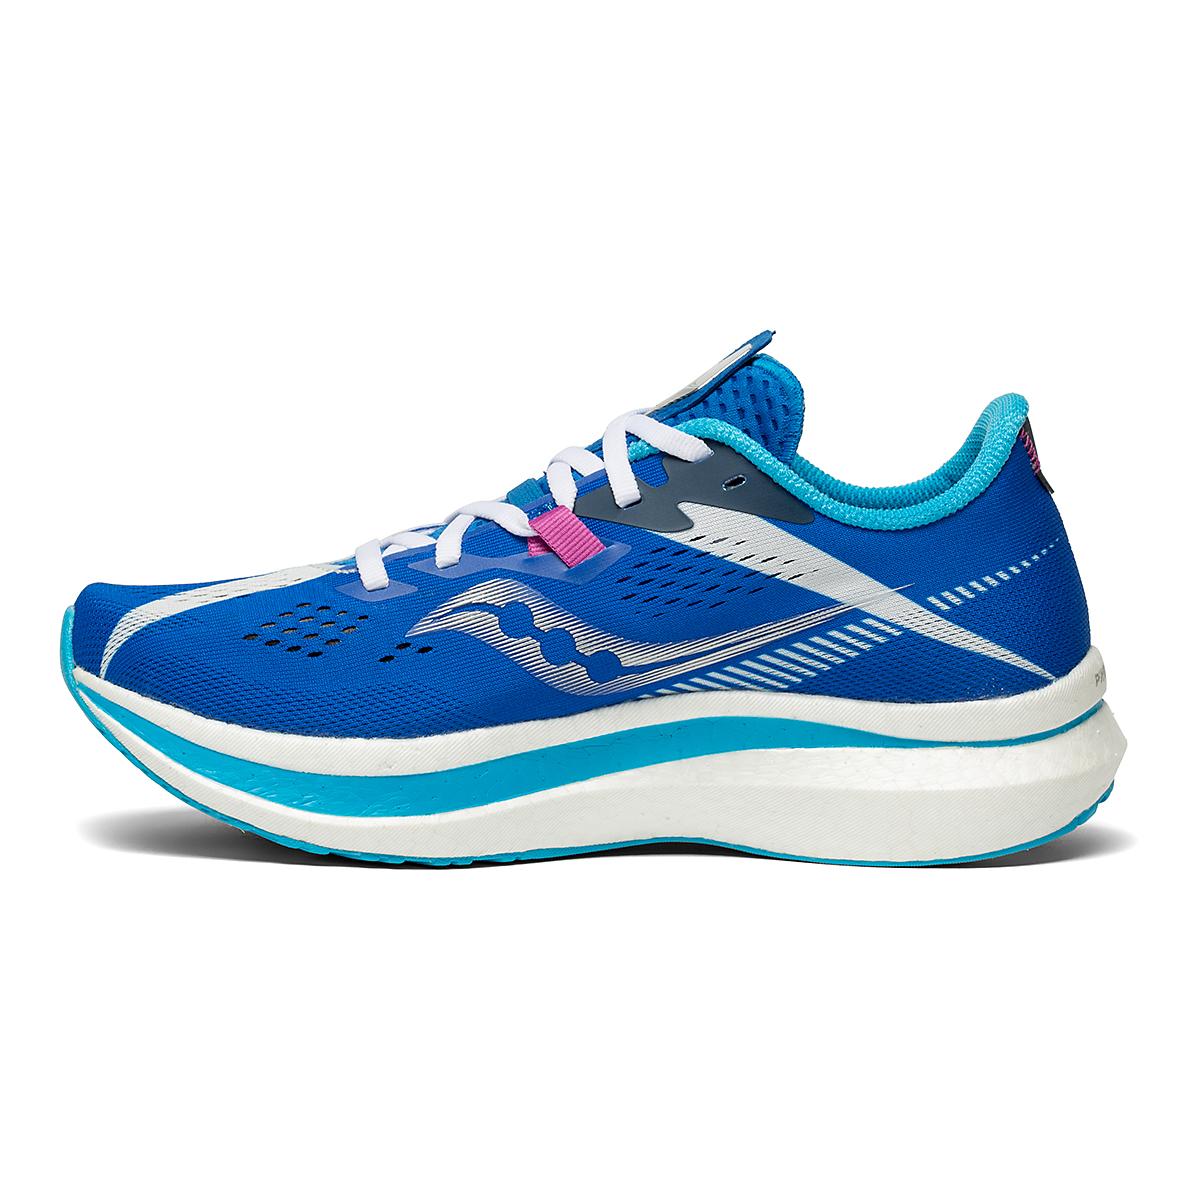 Women's Saucony Endorphin Pro 2 Running Shoe - Color: Royal/White - Size: 5 - Width: Regular, Royal/White, large, image 2